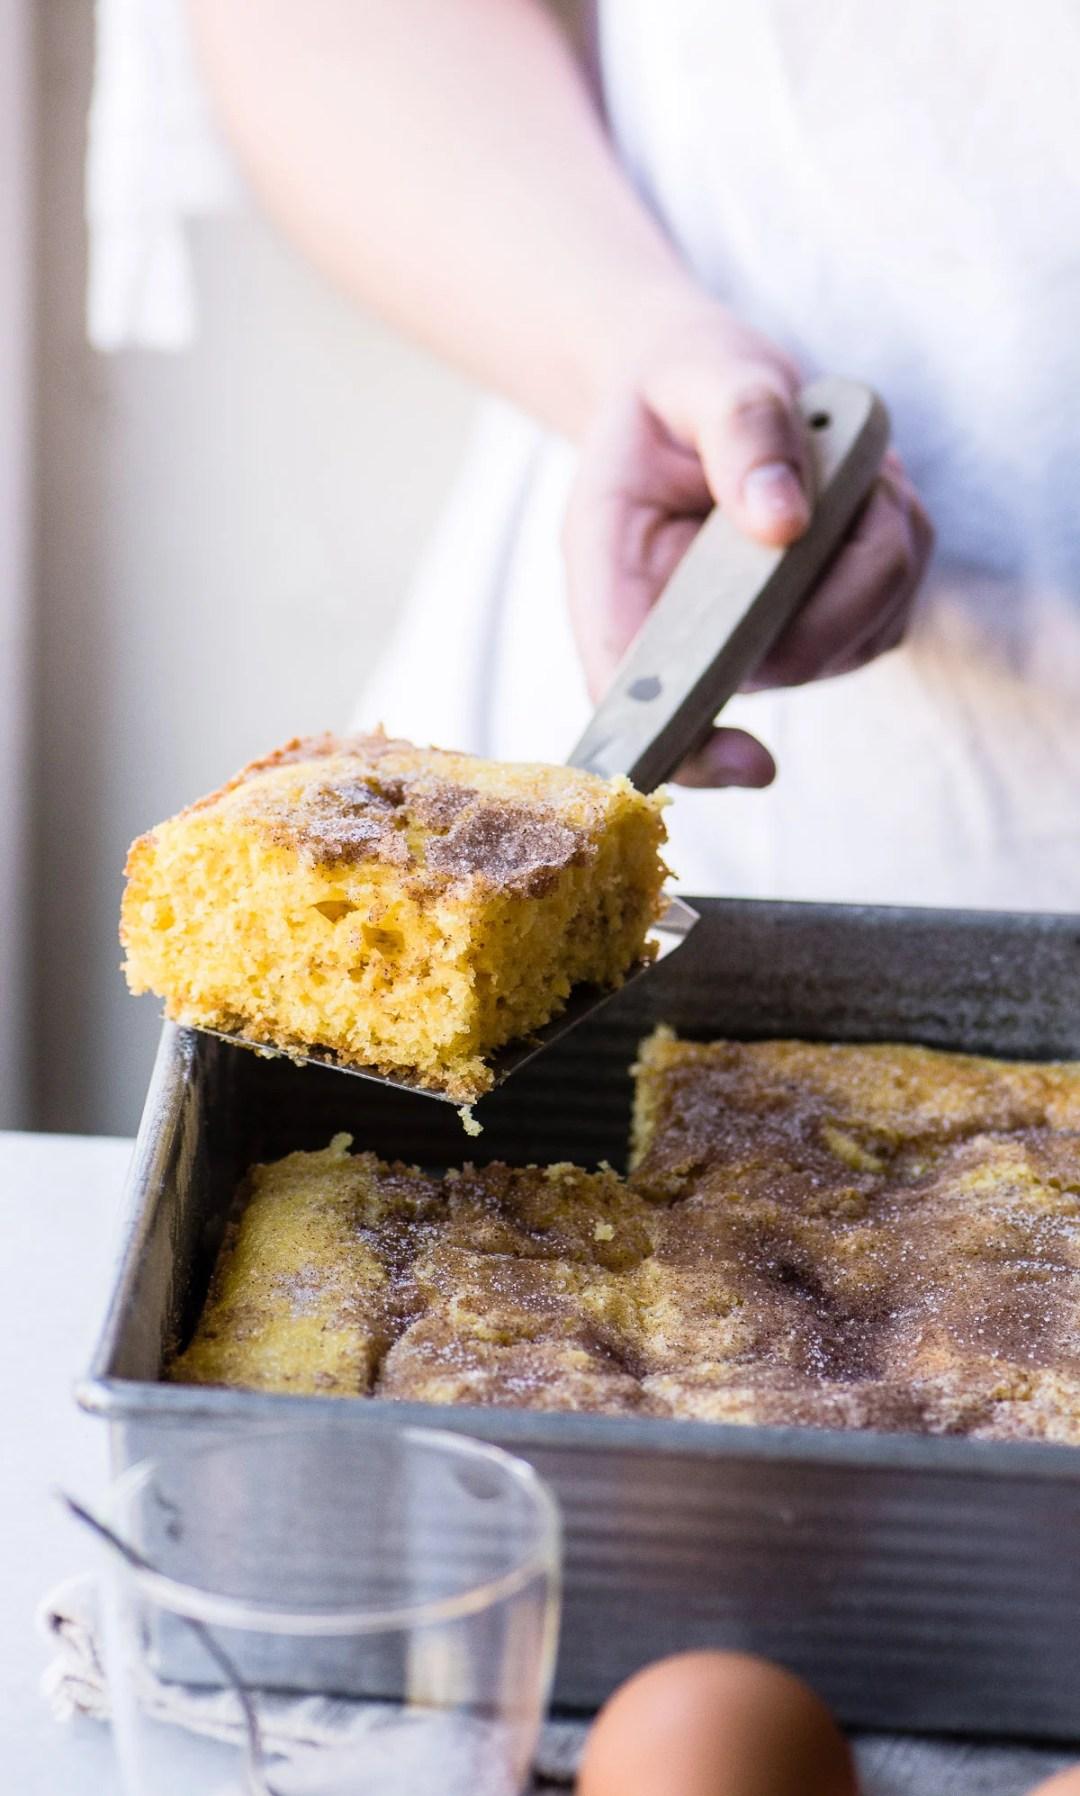 Cutting a piece of super easy cinnamon coffee cake